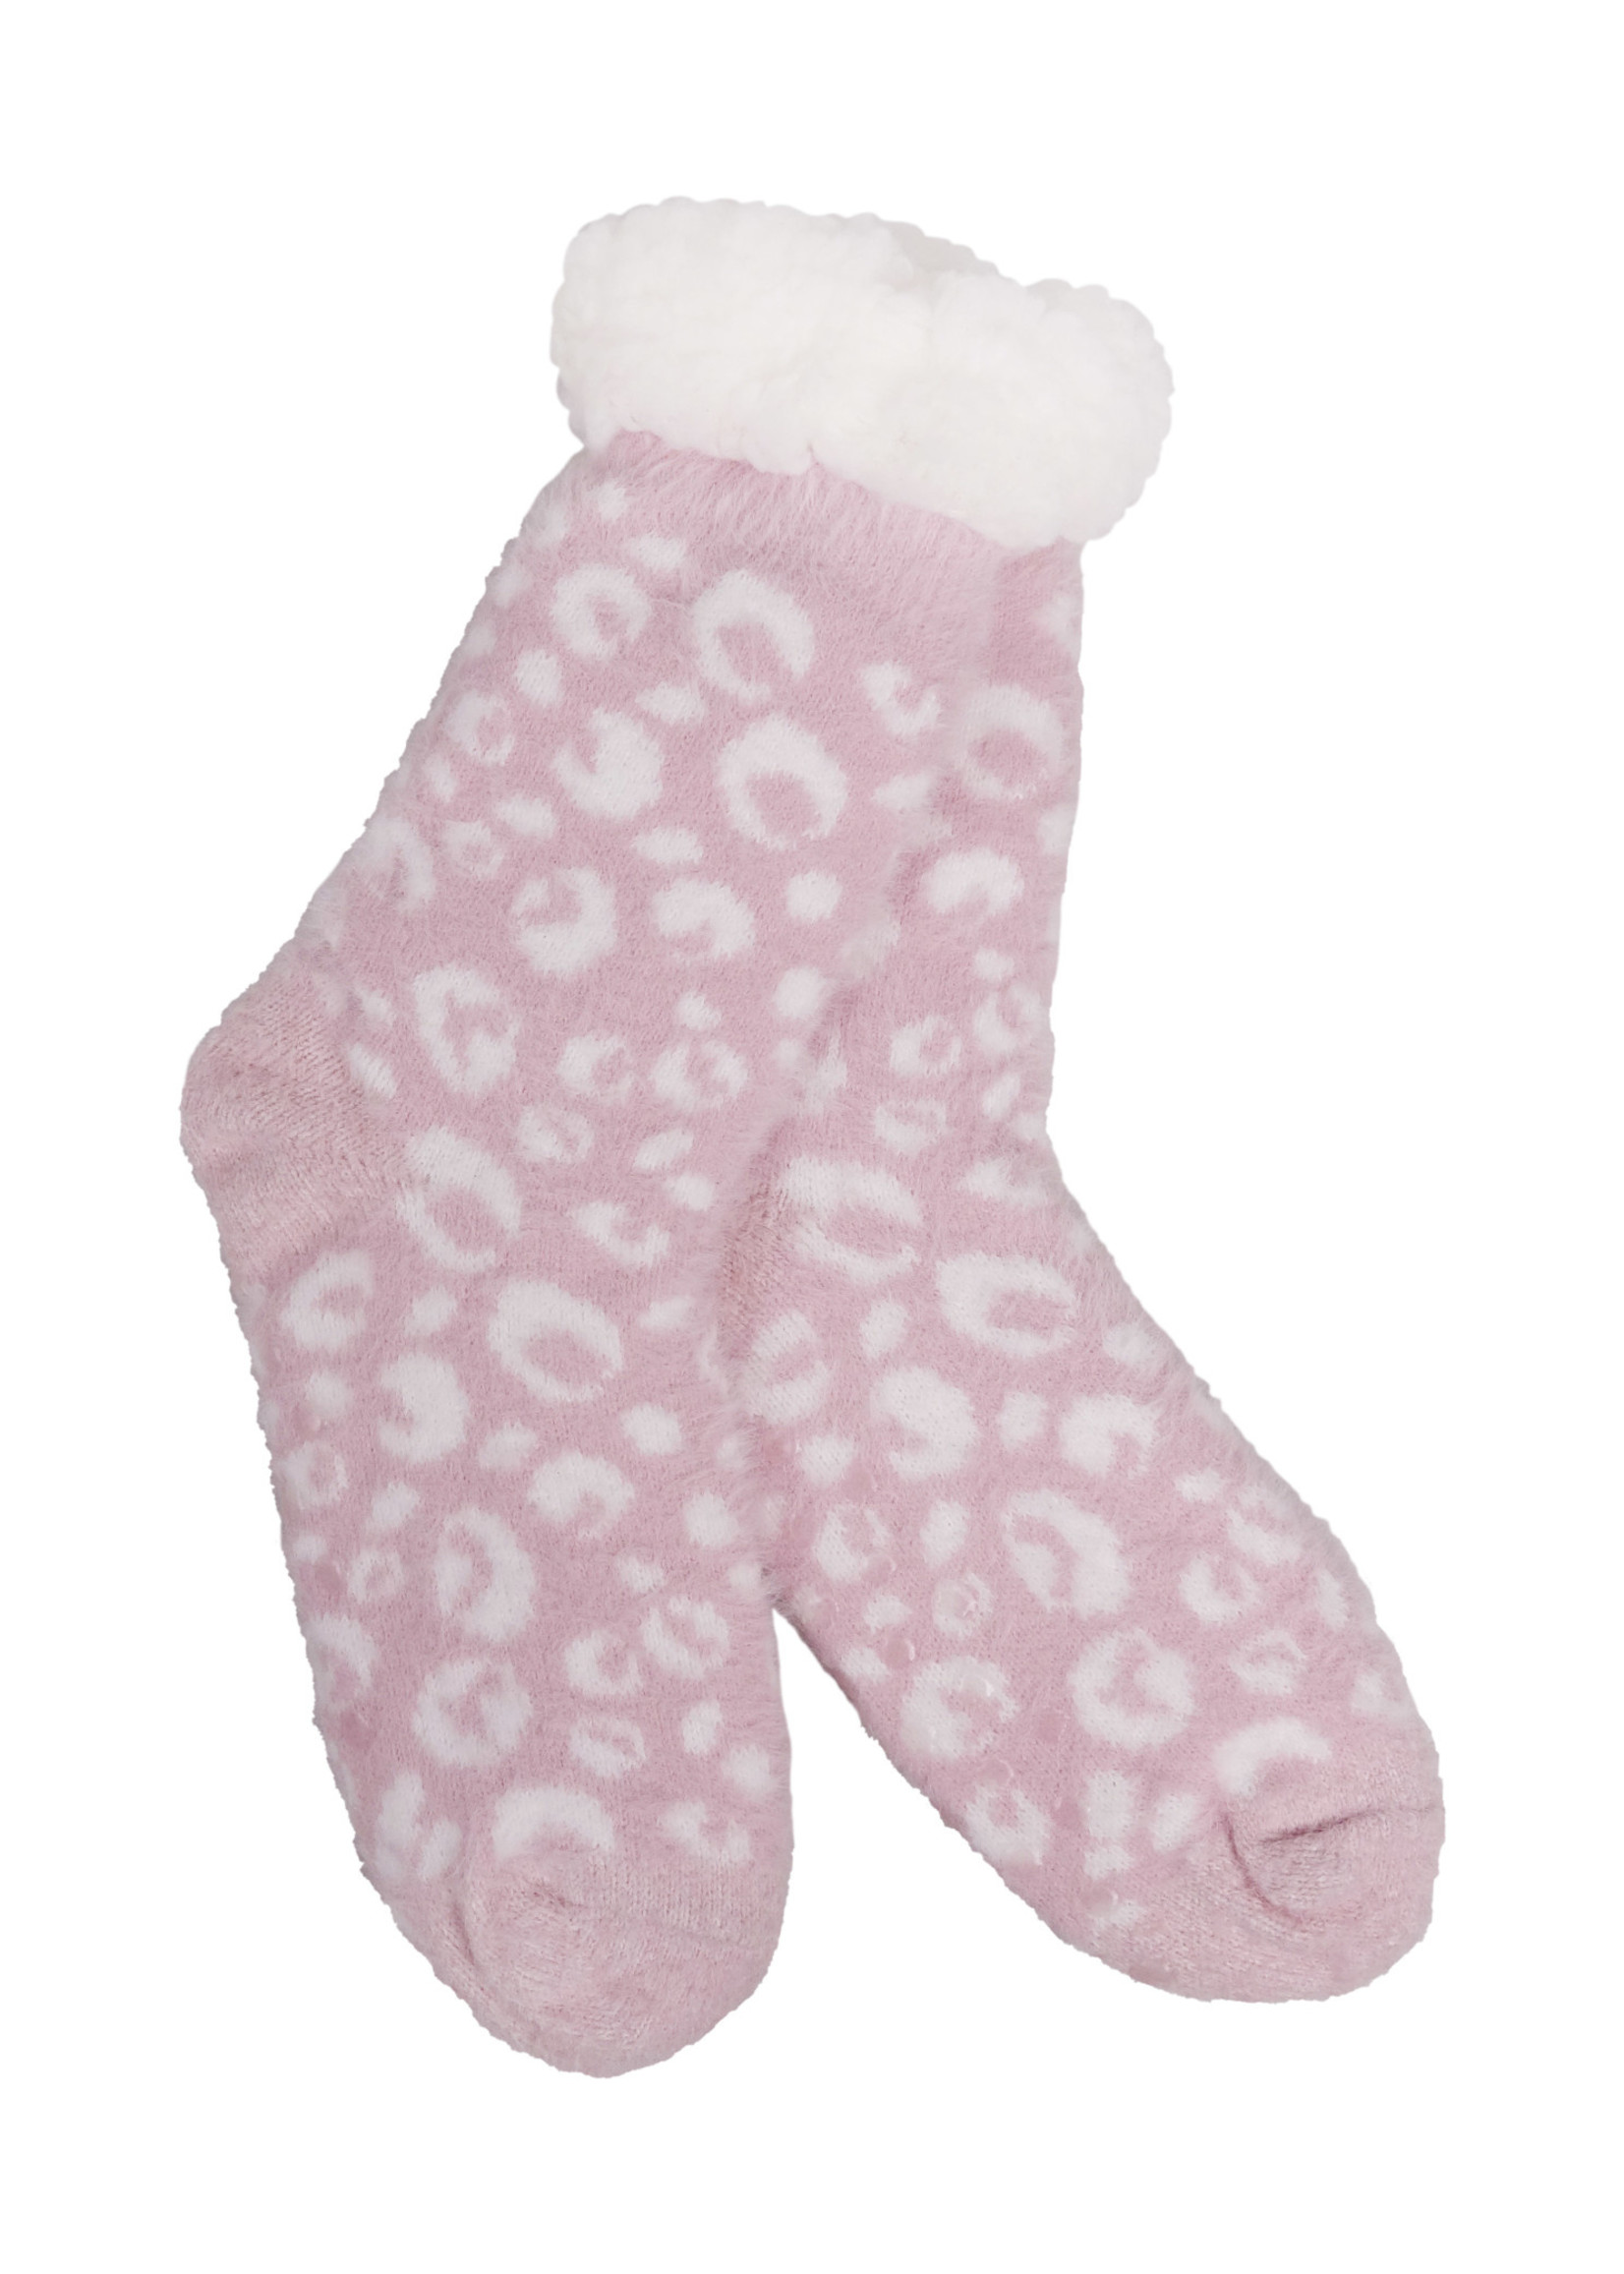 Fashion by Mirabeau Cozy Soft 7th Ave Thermal Slipper Socks